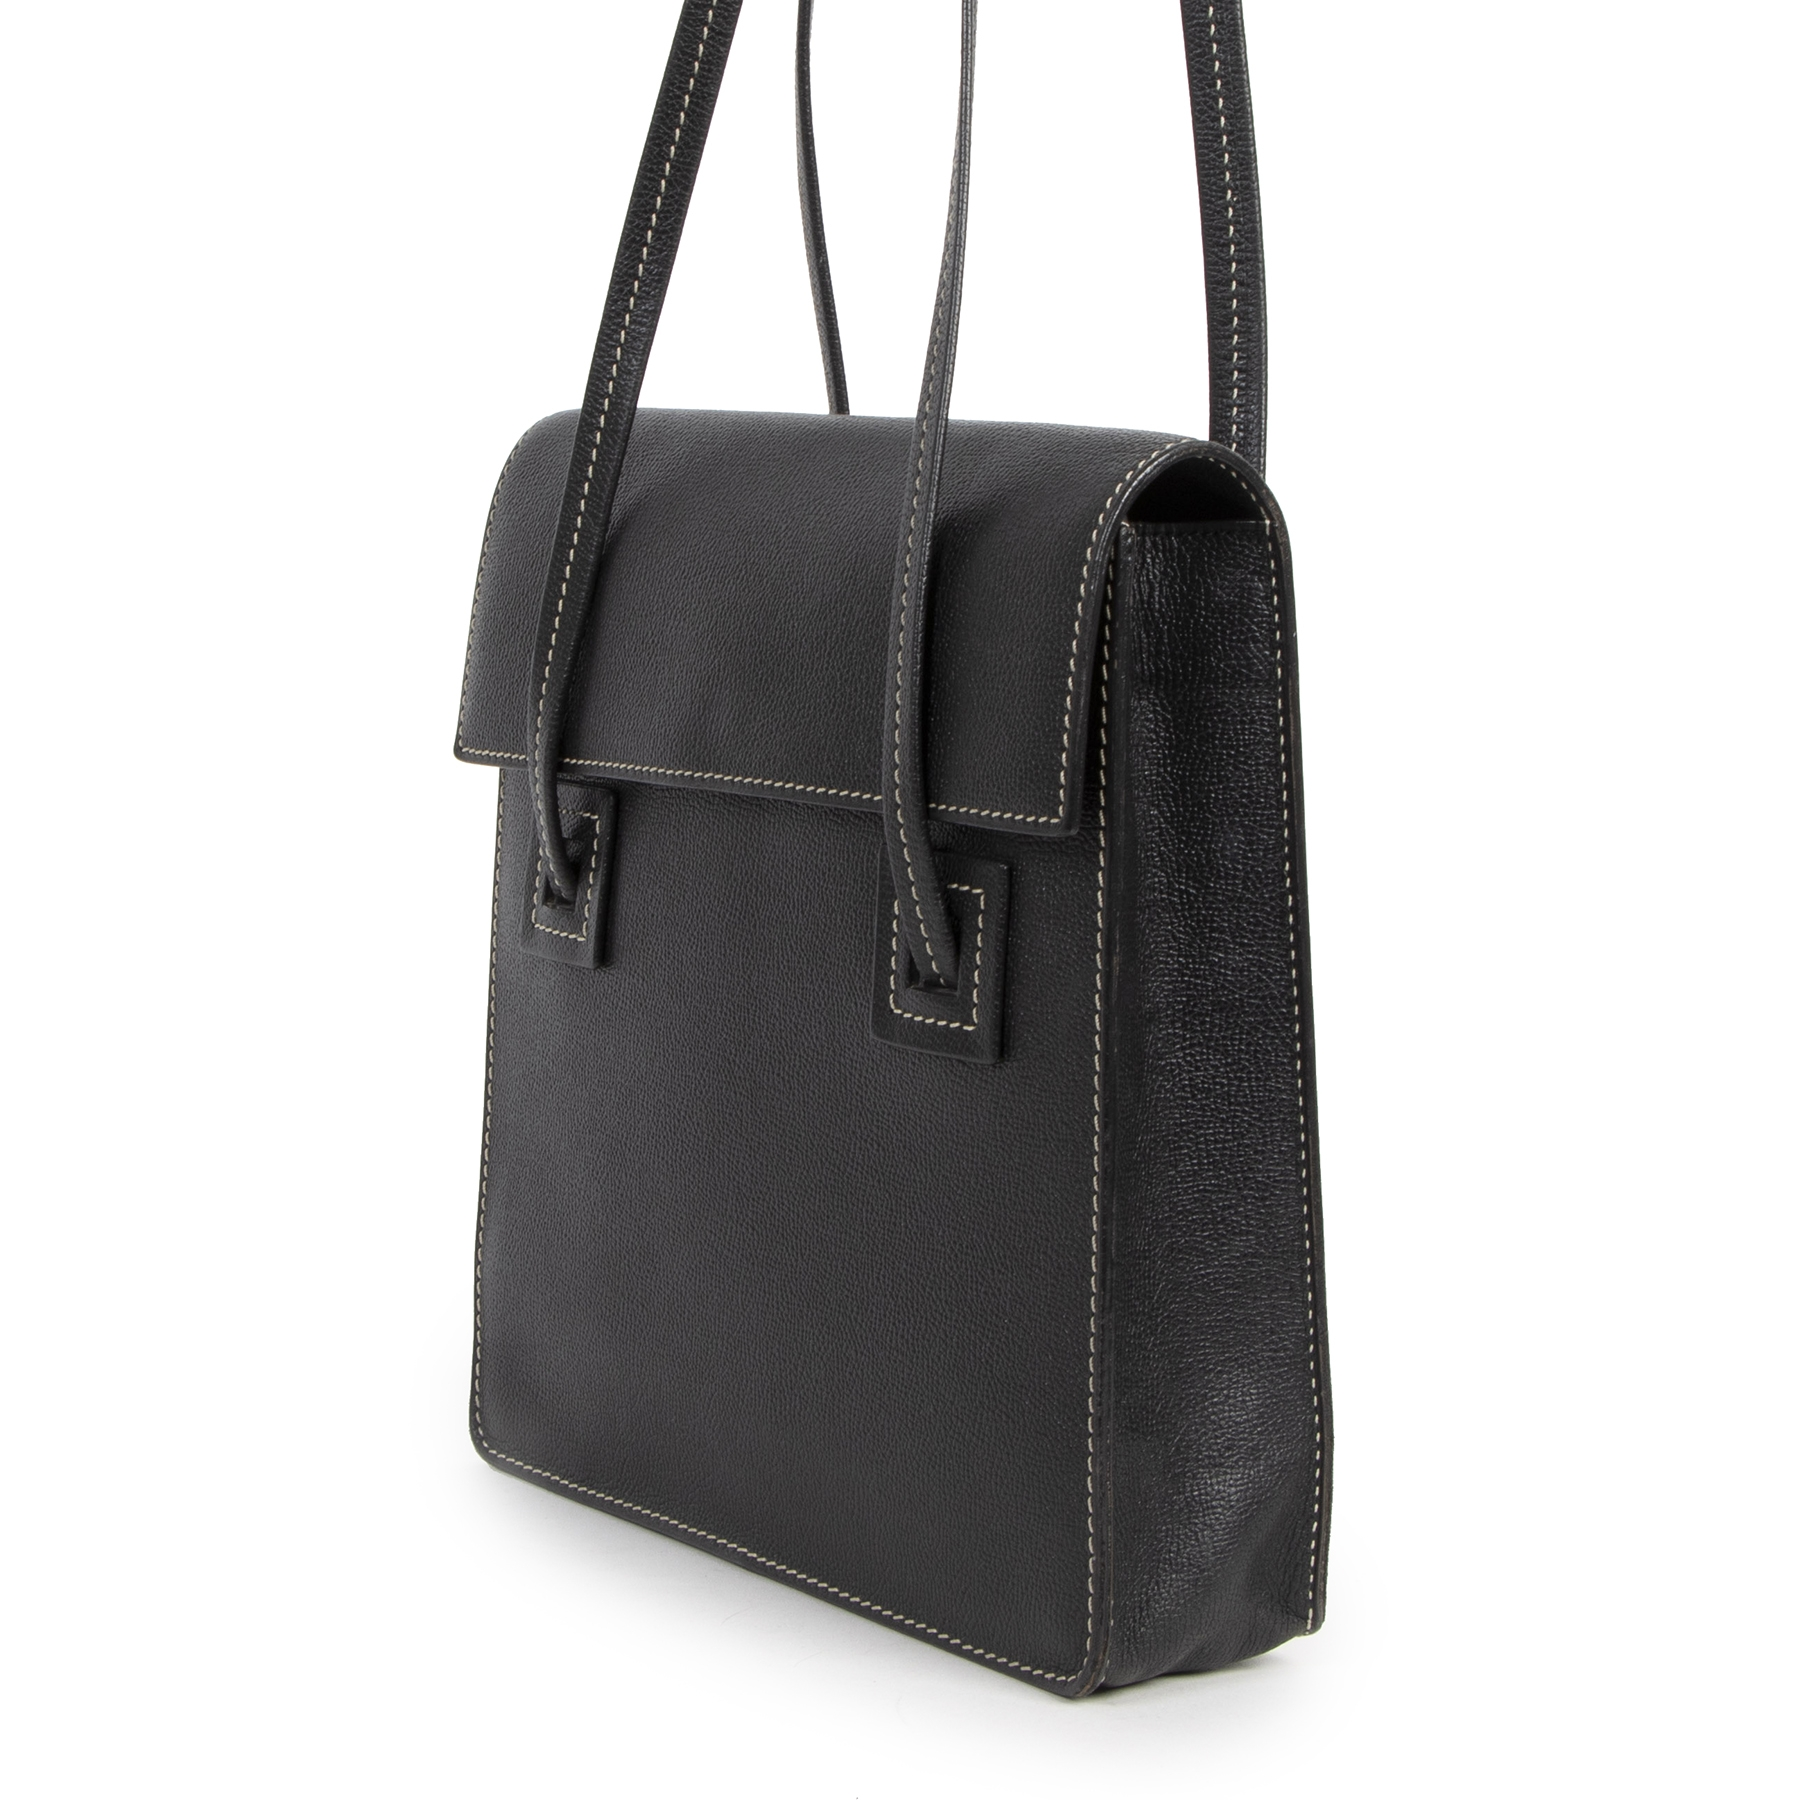 Authentieke tweedehands vintage Delvaux Black Santal Shoulder Bag koop online webshop LabellOV